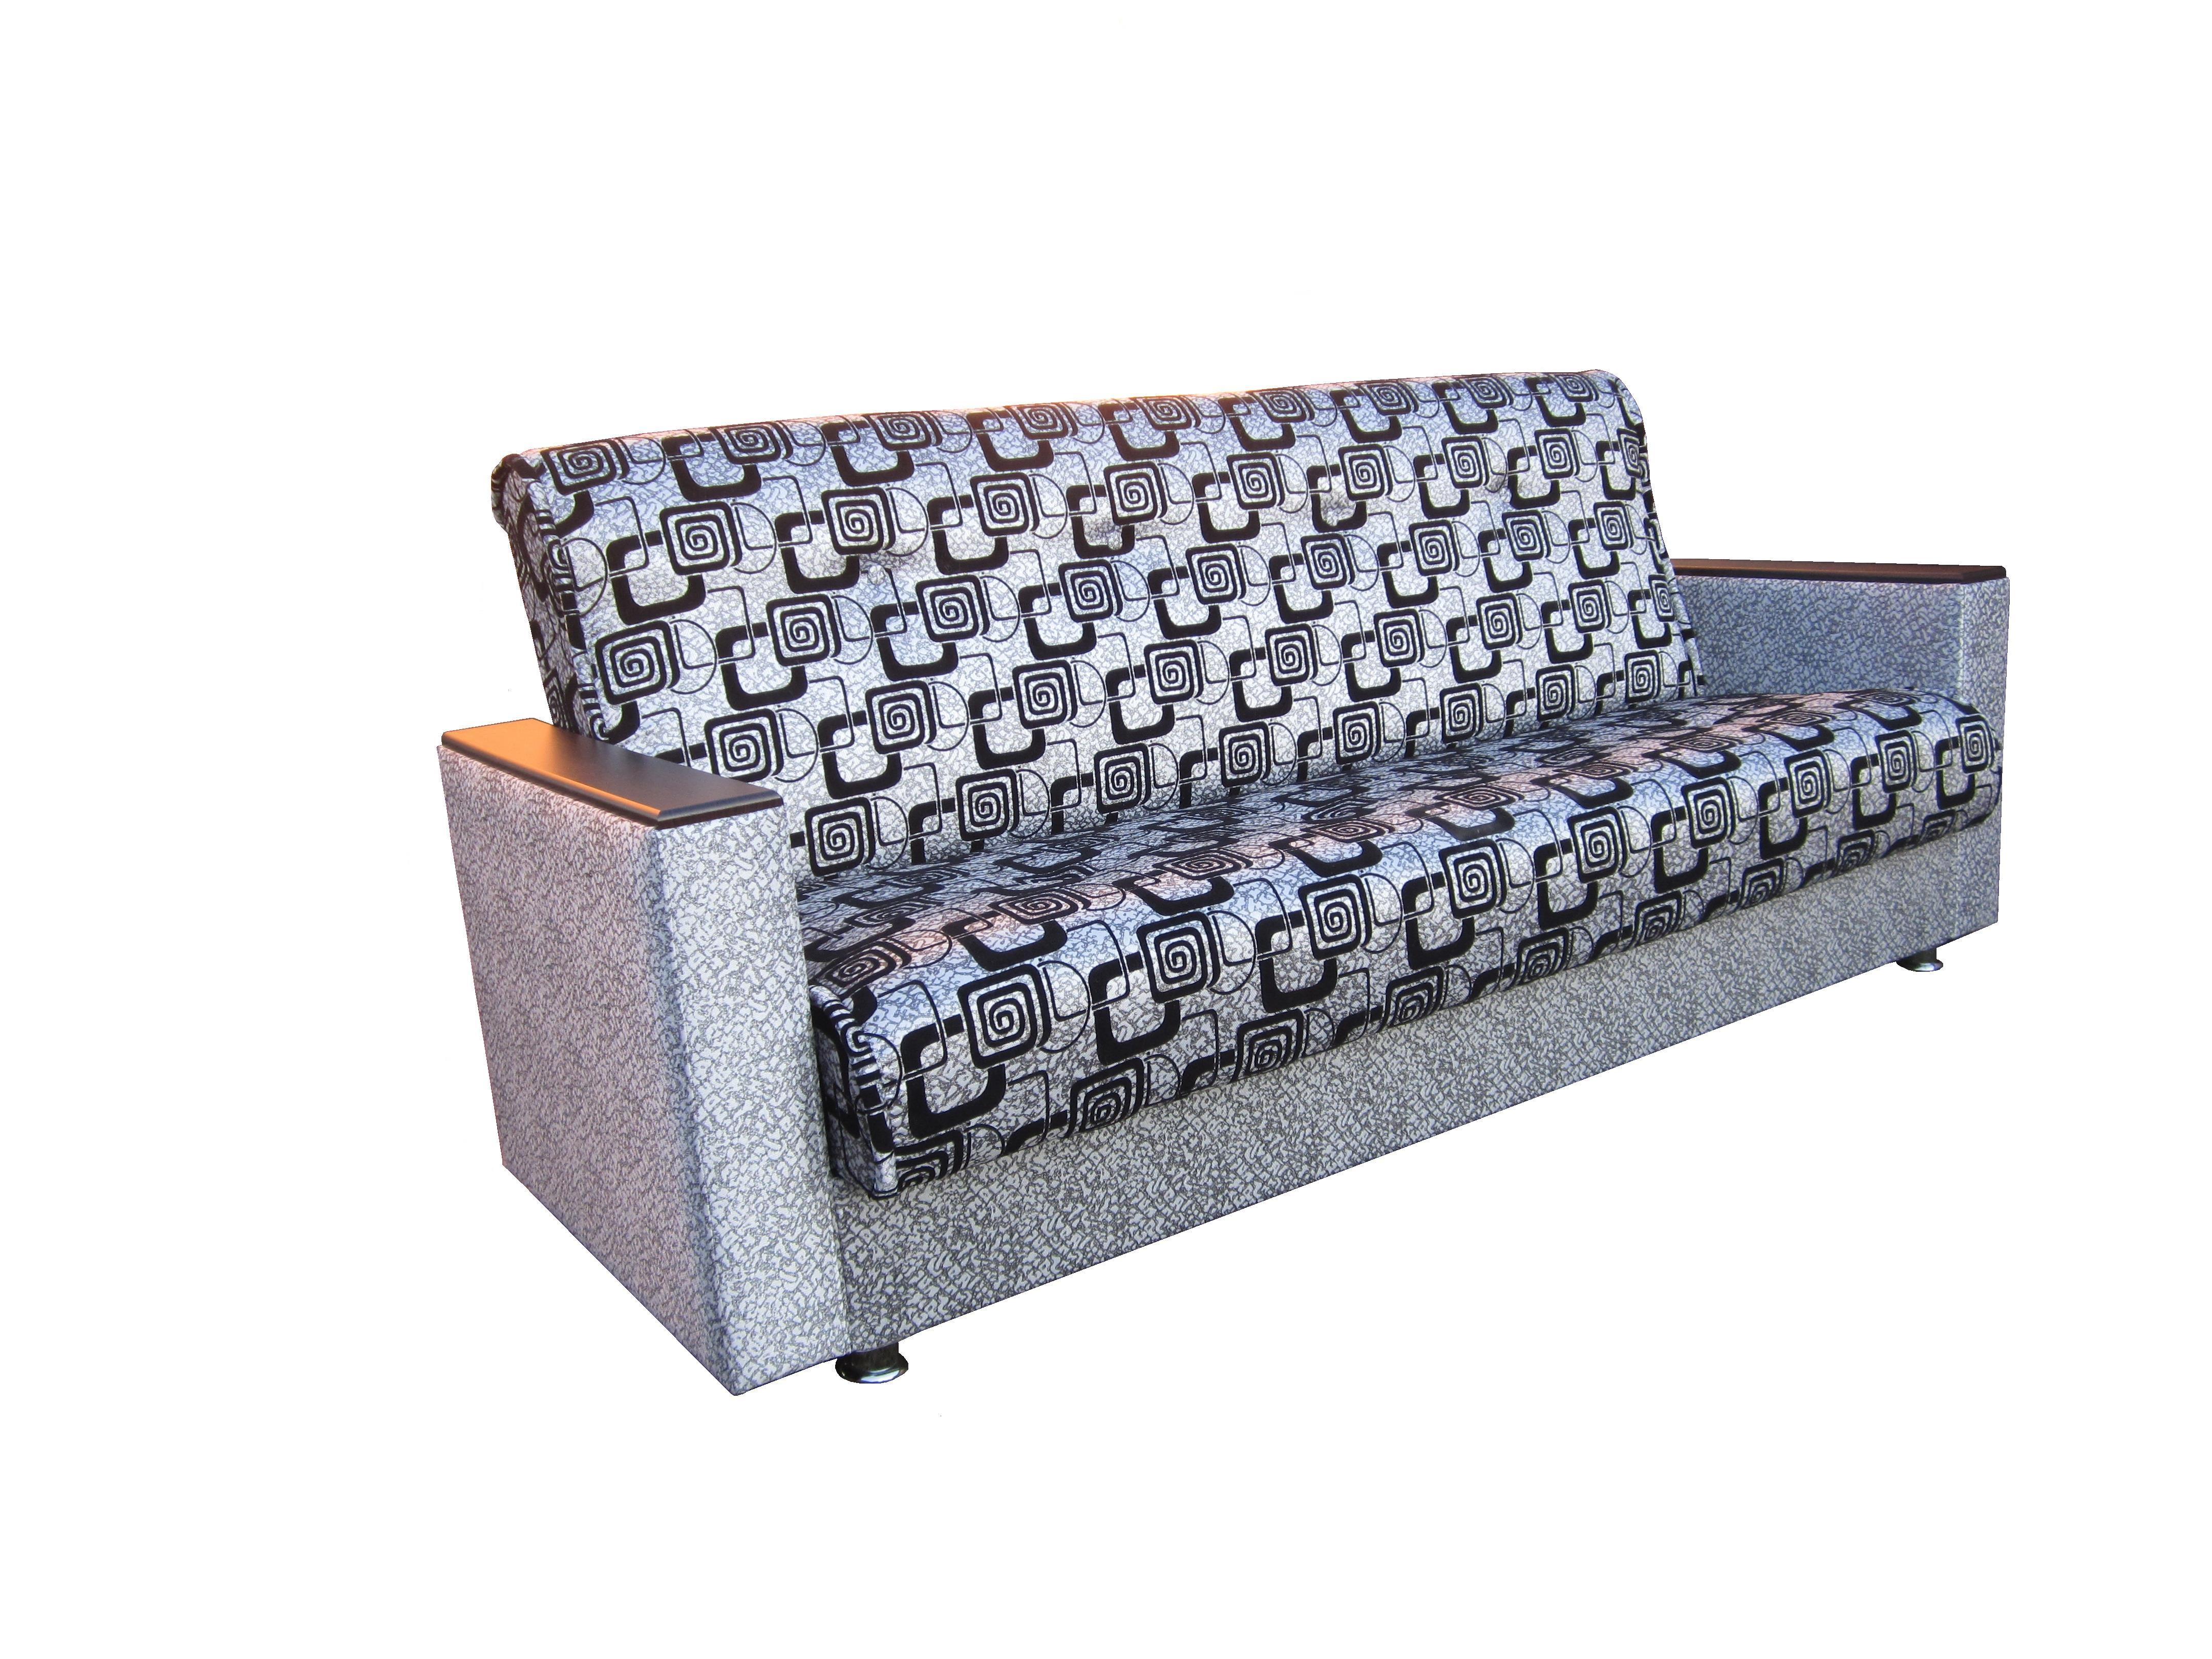 Dorable sof con muebles de un brazo motivo muebles para for Sofa exterior plegable